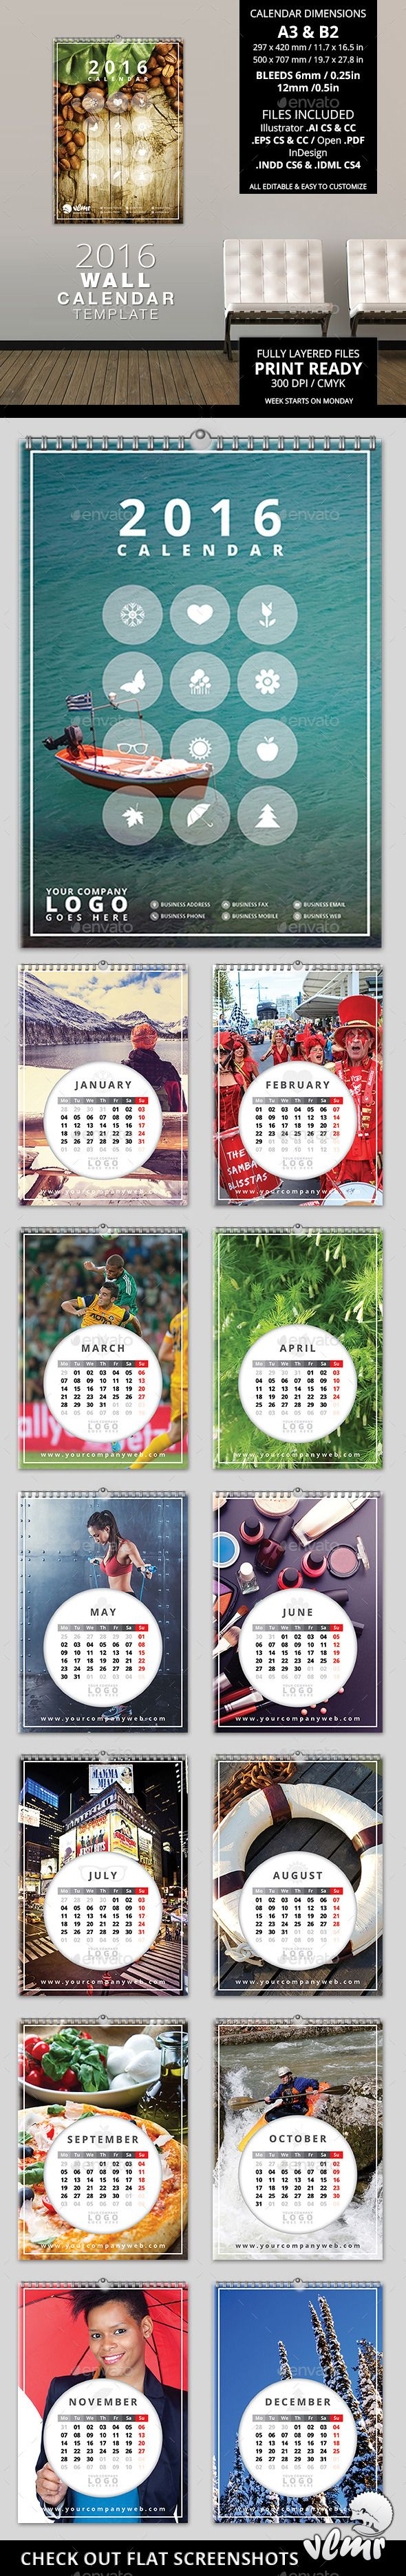 Circles - 2016 Wall Calendar Template #design Download: http://graphicriver.net/item/circles-2016-wall-calendar-template/13195586?ref=ksioks